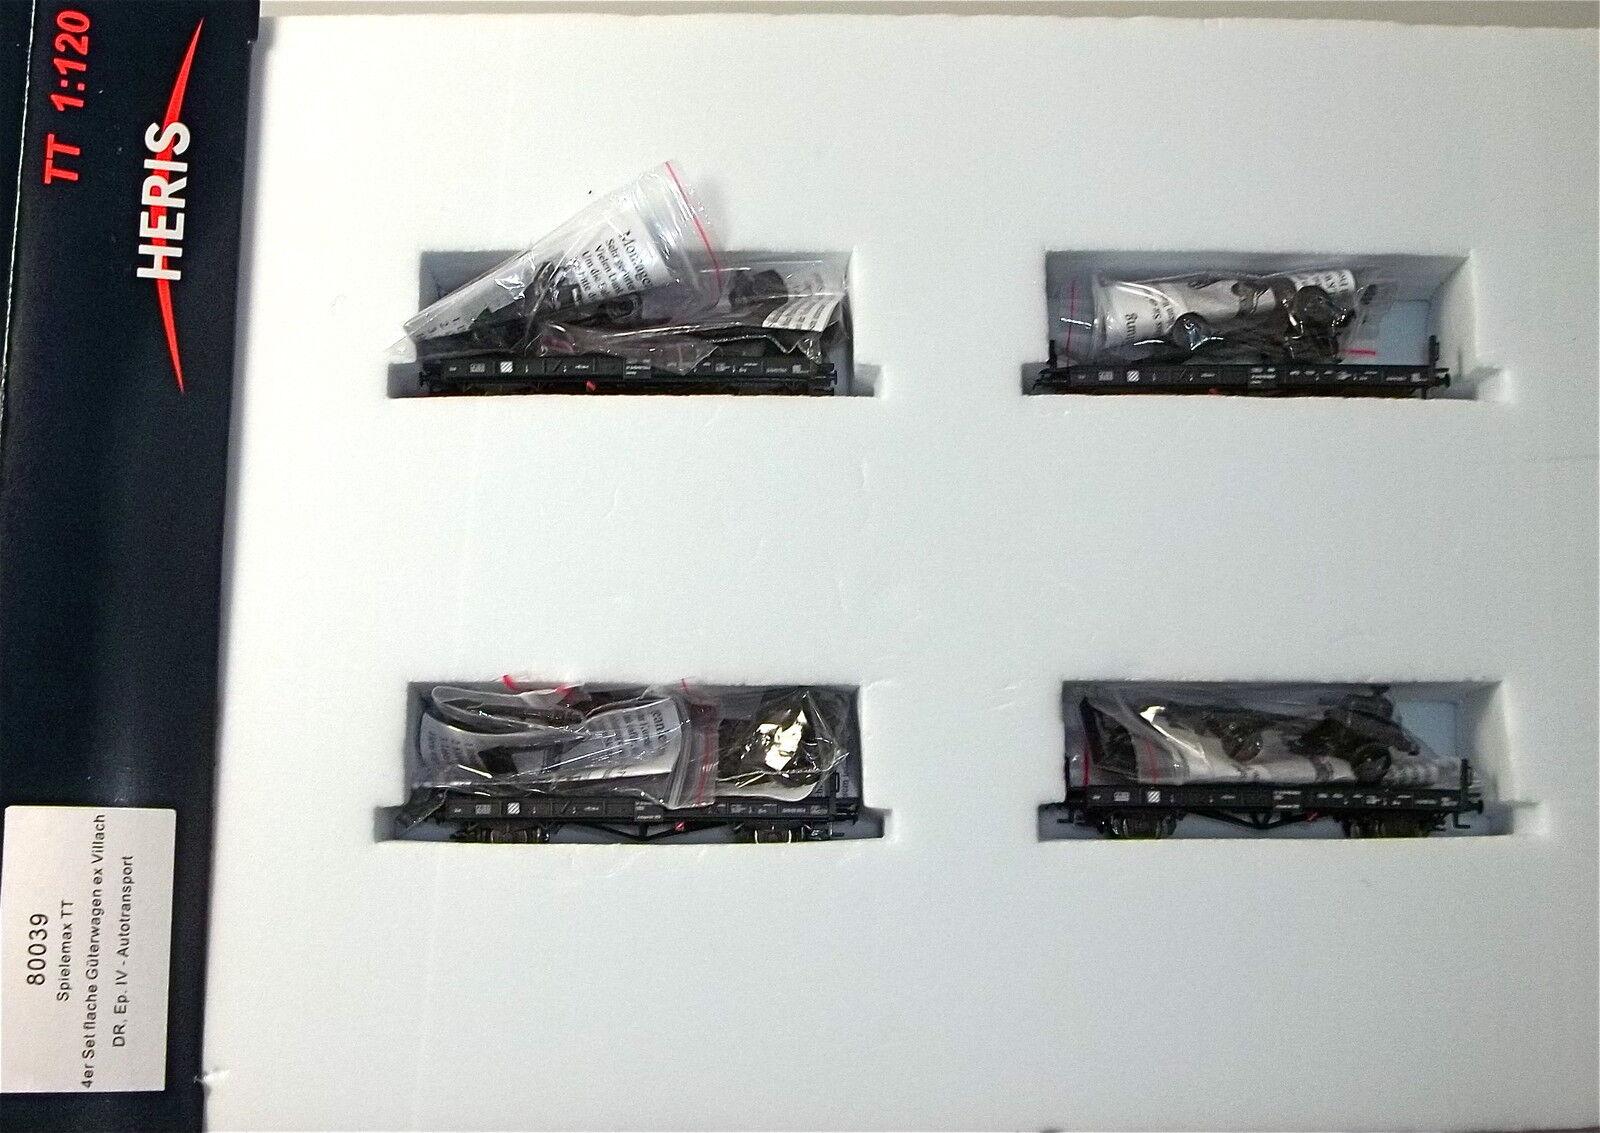 4tlg Set piatto carrello ex Villach M CAMION chassis DR ep4 HERIS 80039 TT 1:120 hl6 Å *